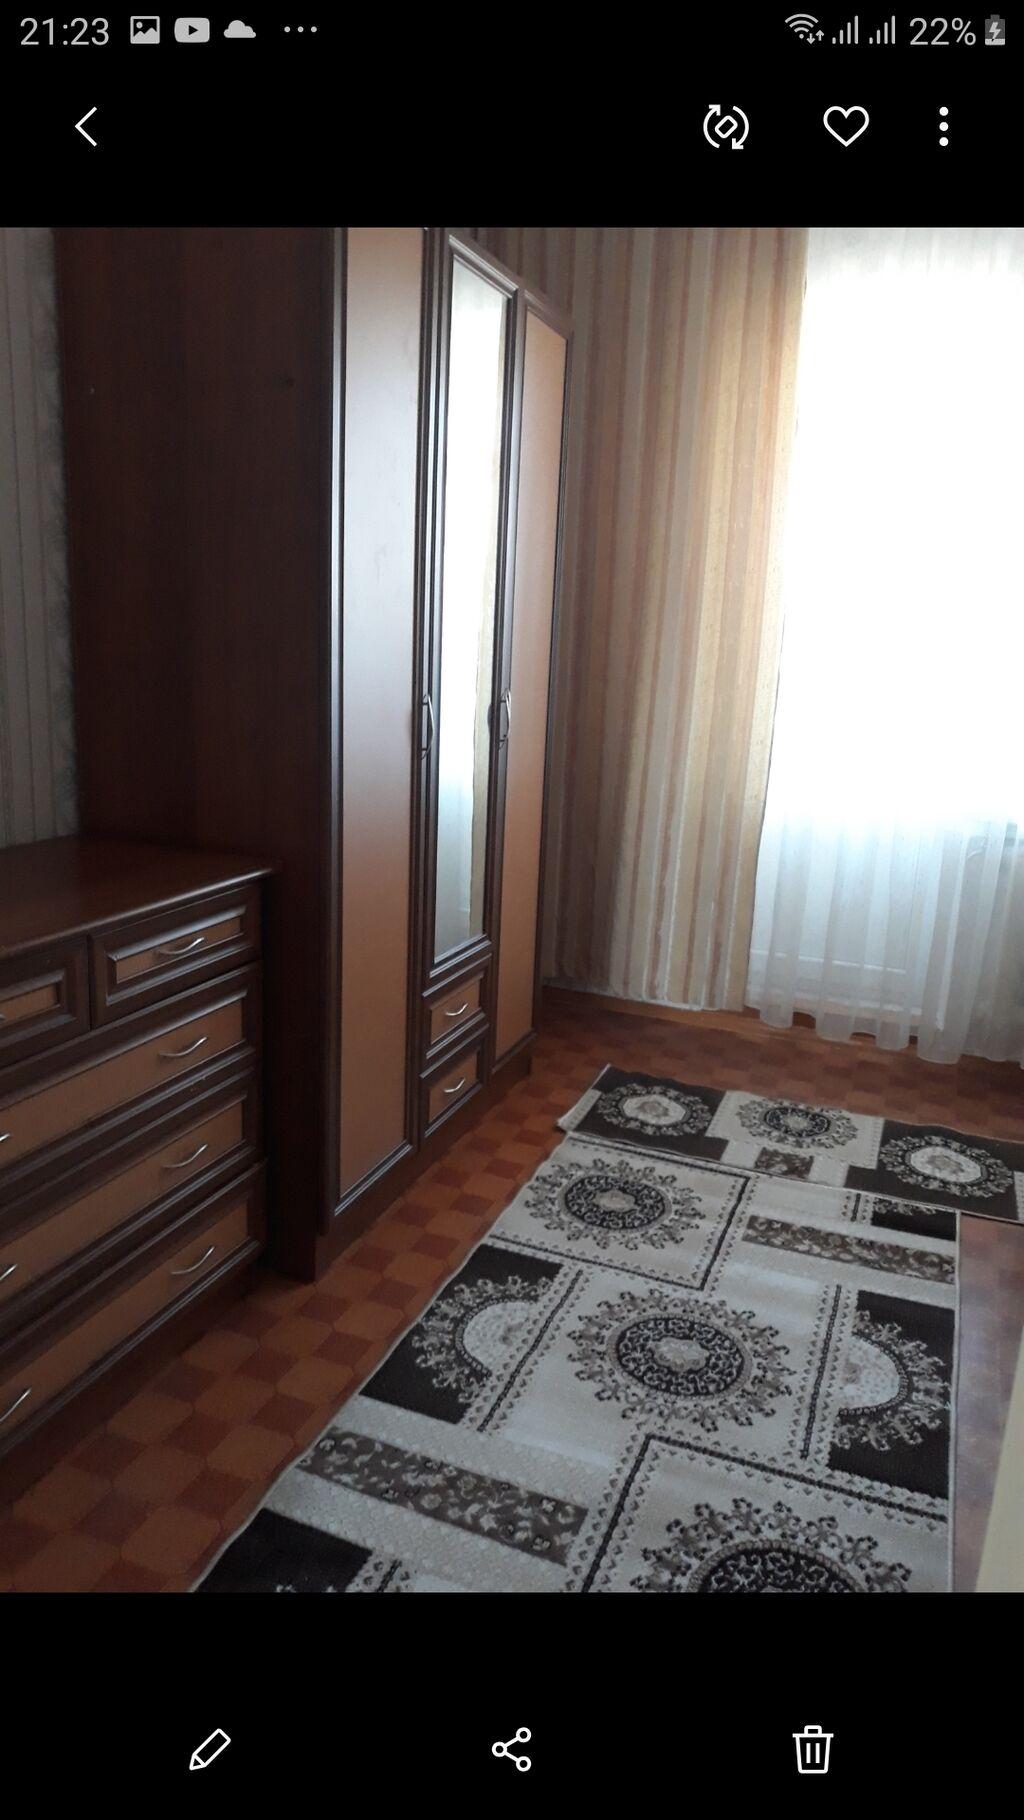 Сдается квартира: 2 комнаты, 48 кв. м, Бишкек: Сдается квартира: 2 комнаты, 48 кв. м, Бишкек